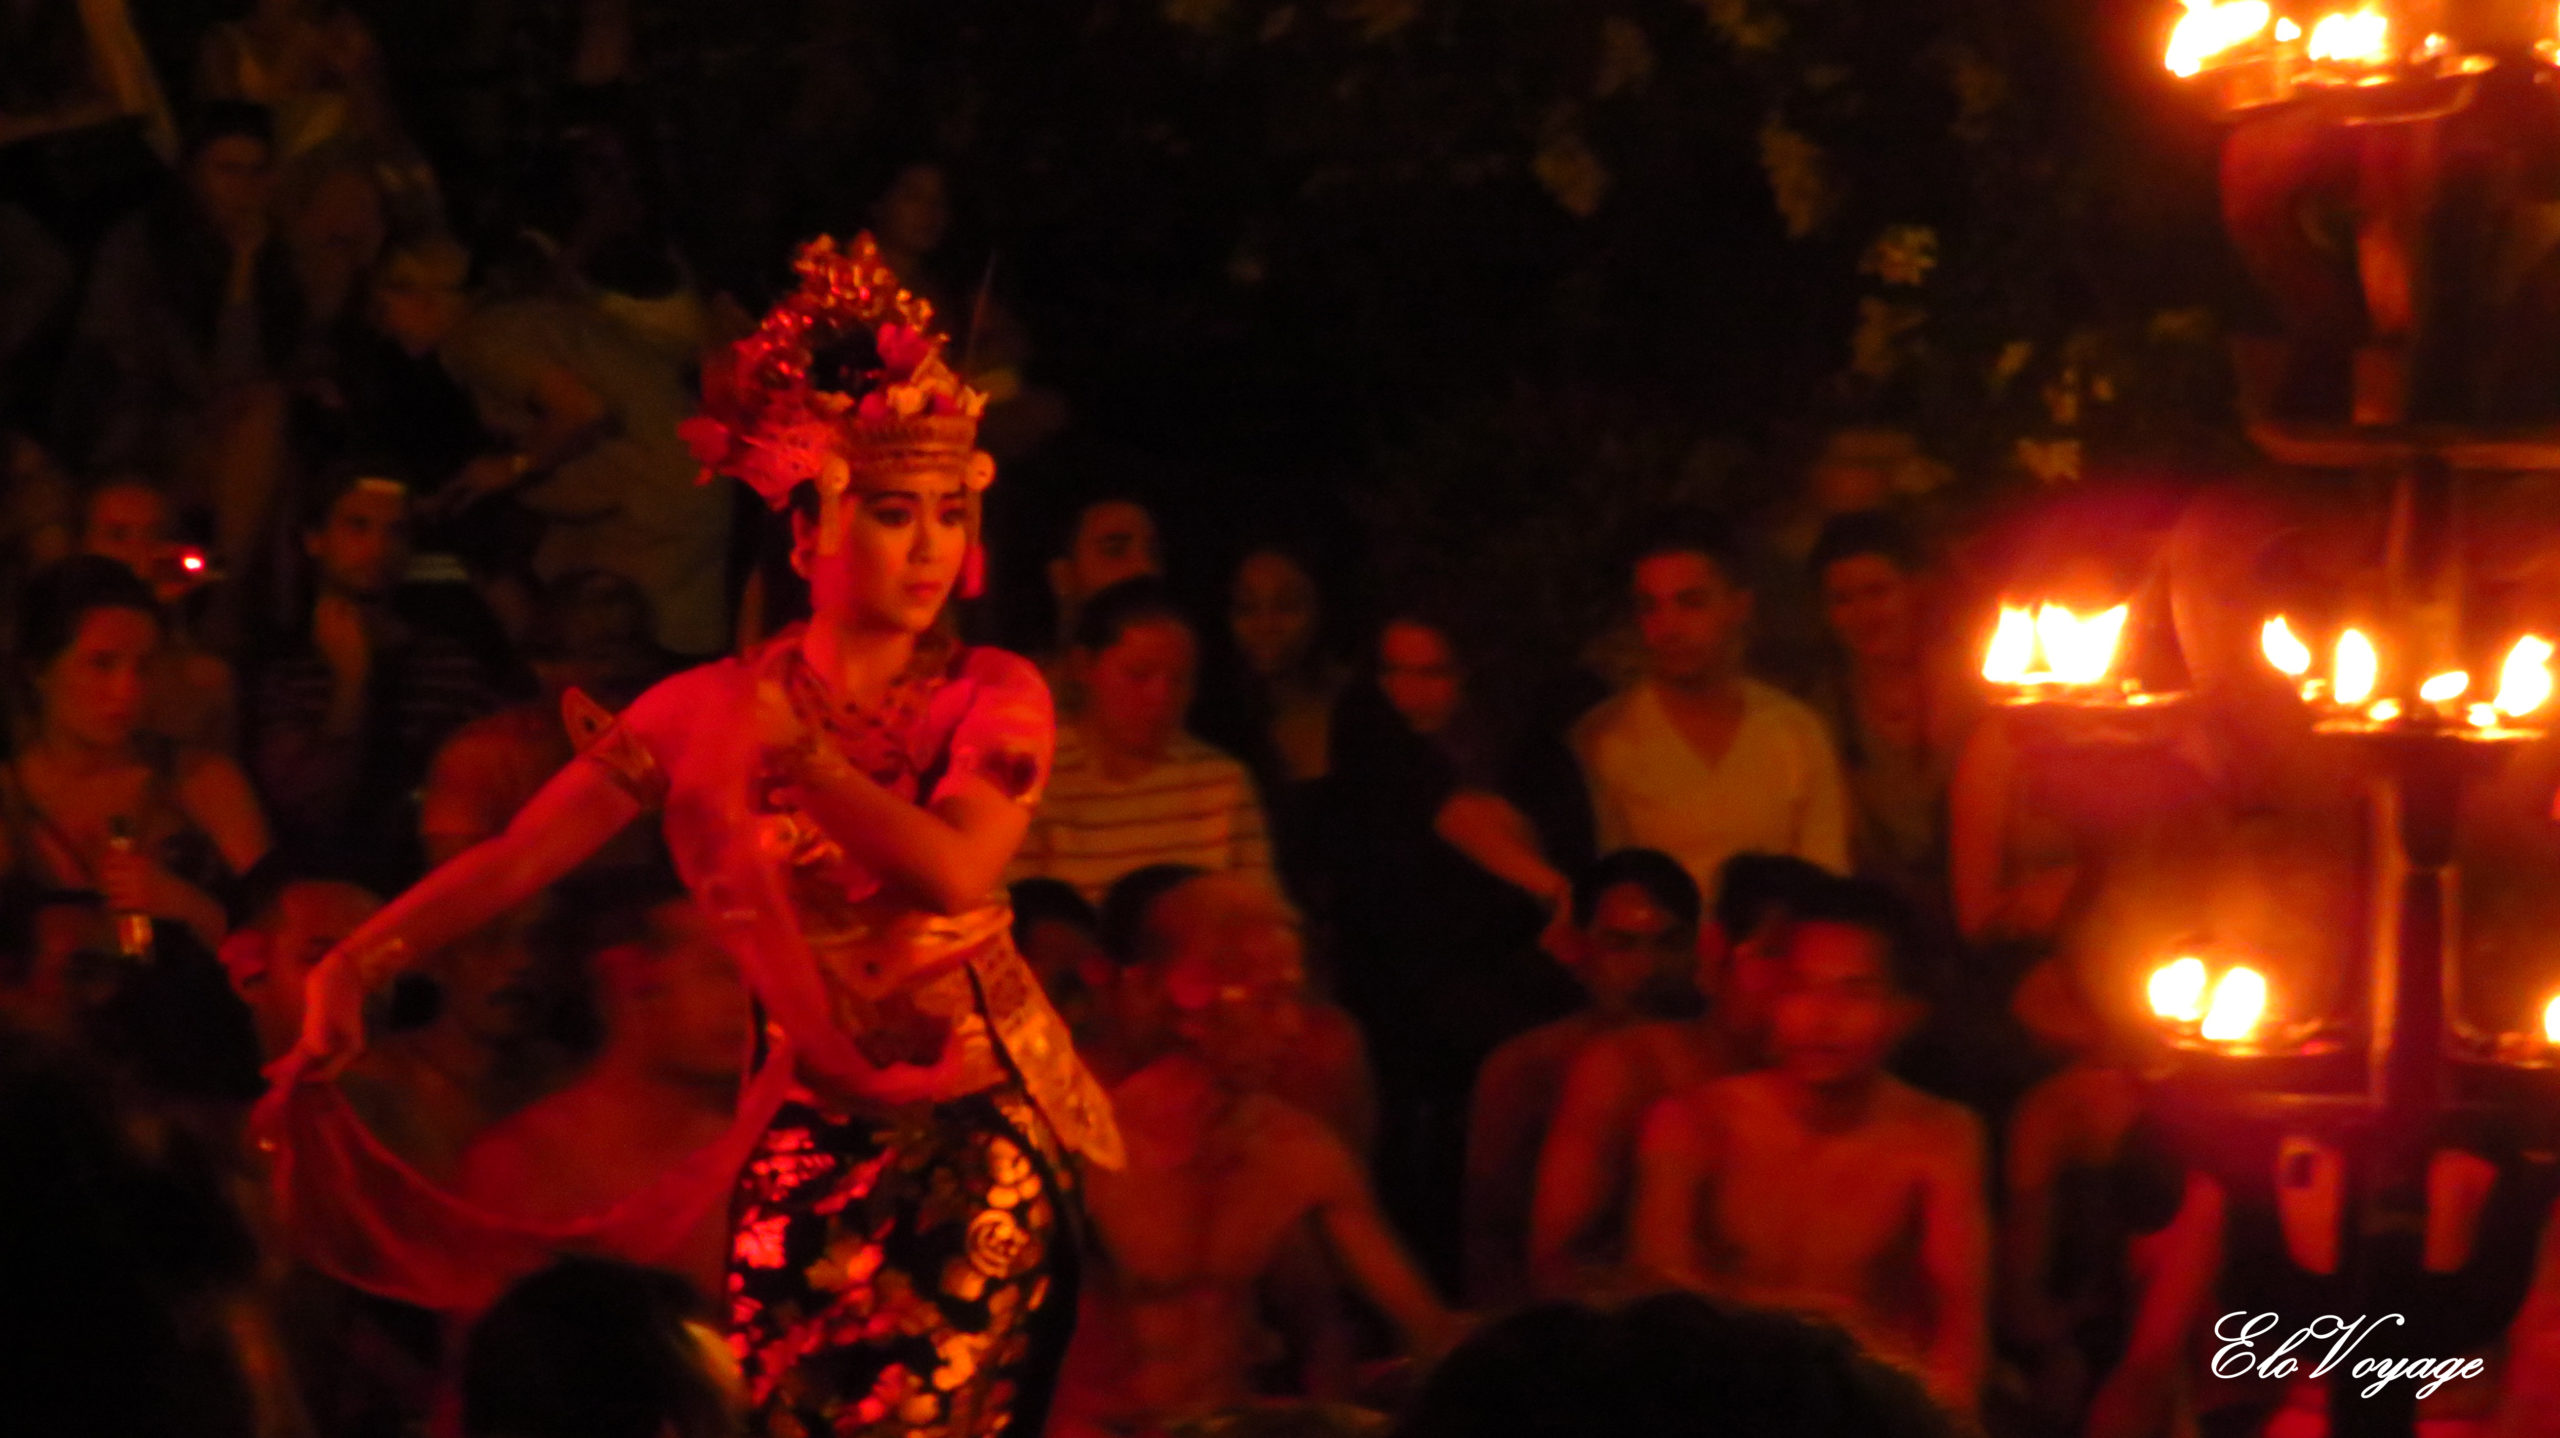 danseuse balinaise kecak dance ubud